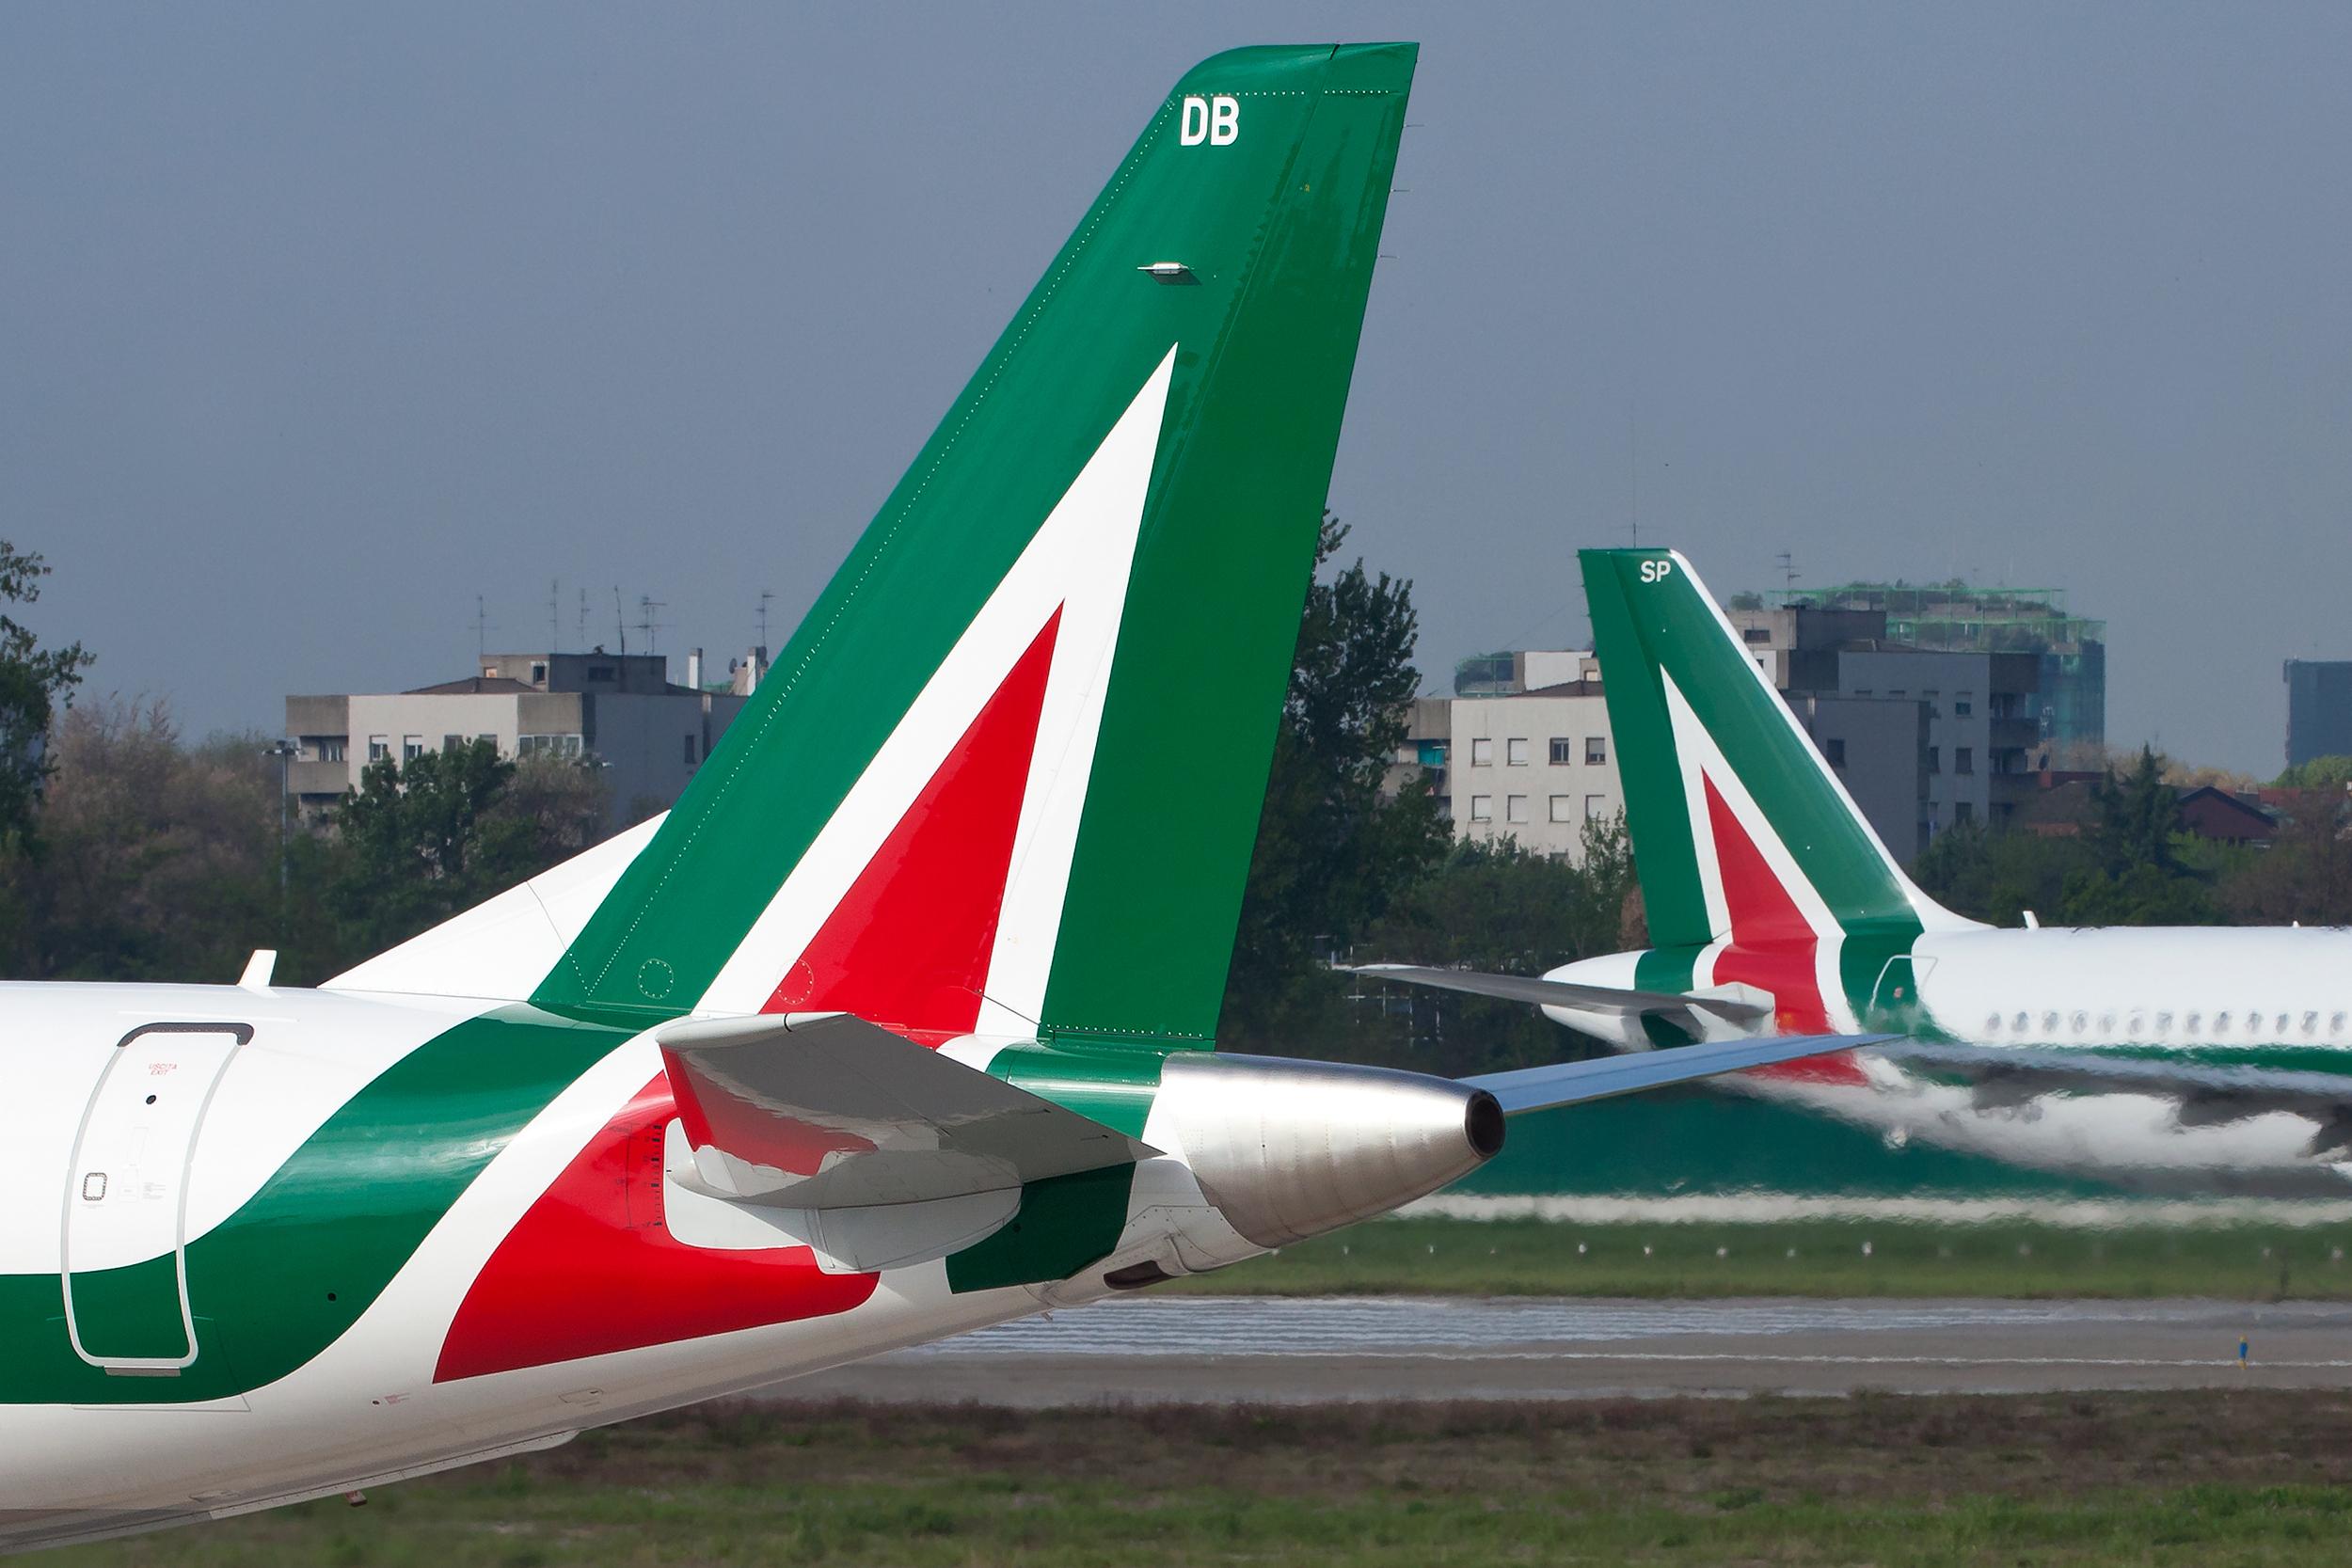 Alitalia-fly i Milanos Linate-lufthavn. (Foto: Davide Calabresi | shutterstock)